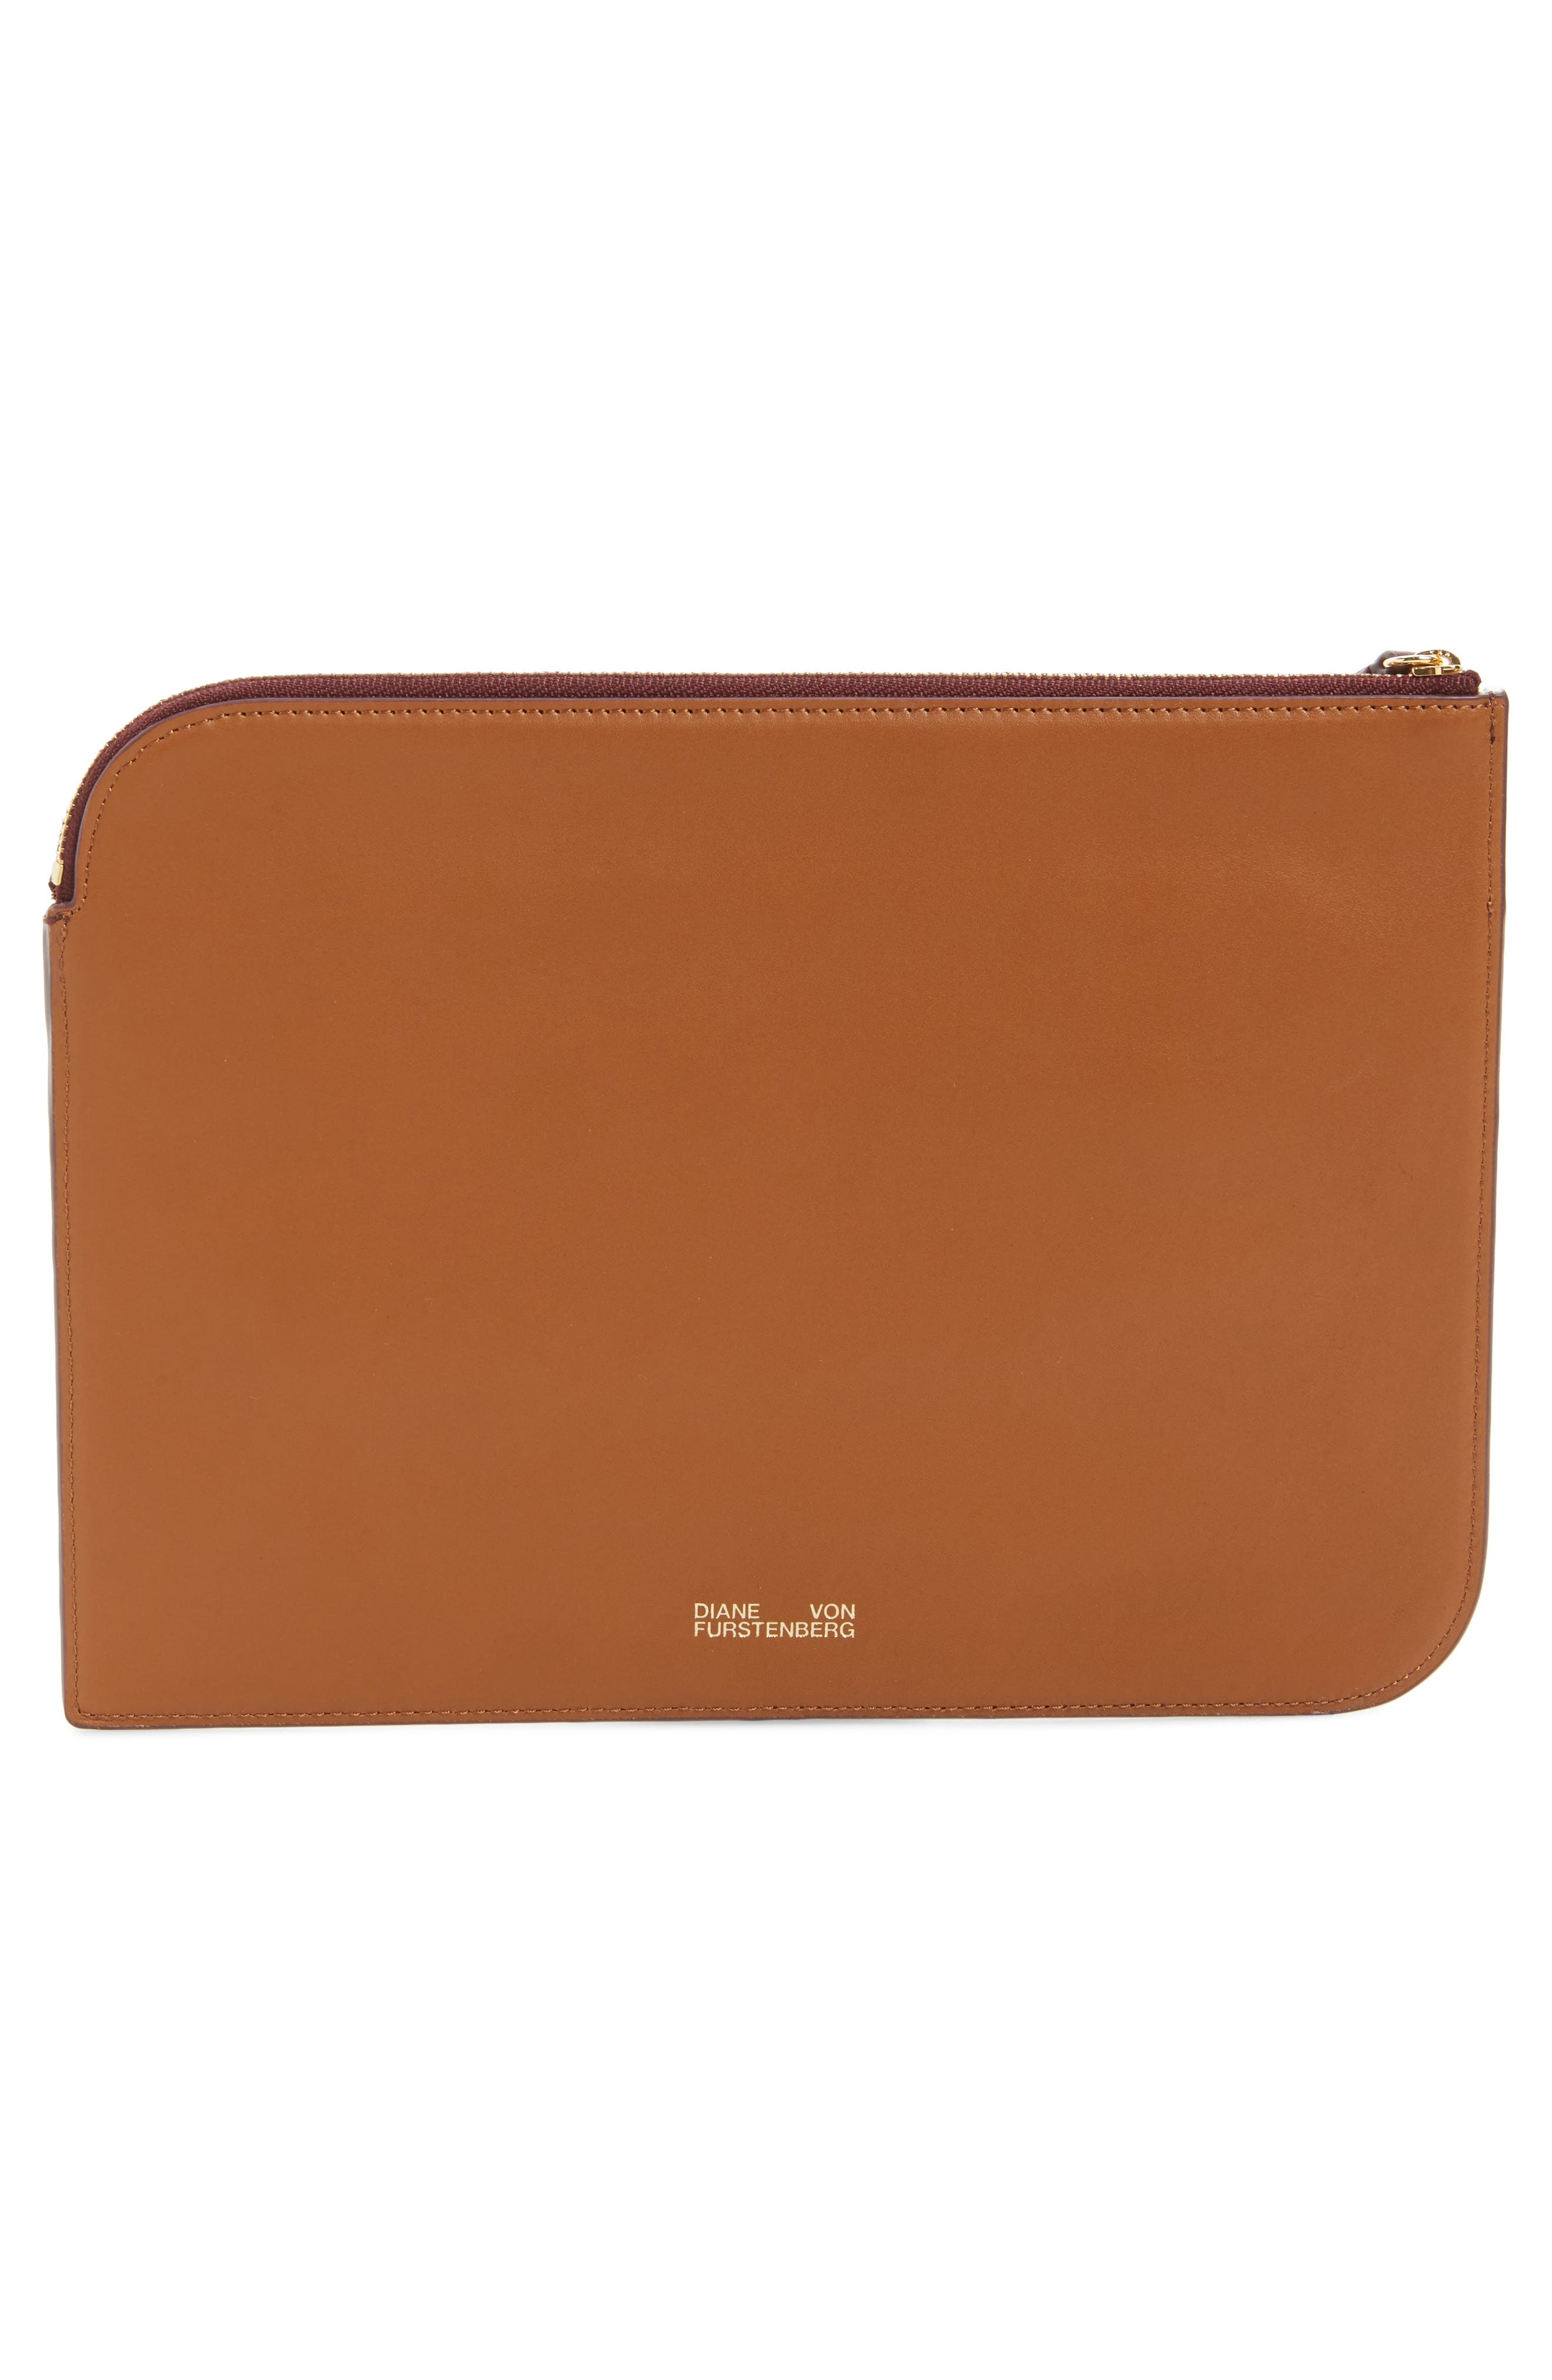 Large Colorblock Leather Zip Pouch,                             Alternate thumbnail 6, color,